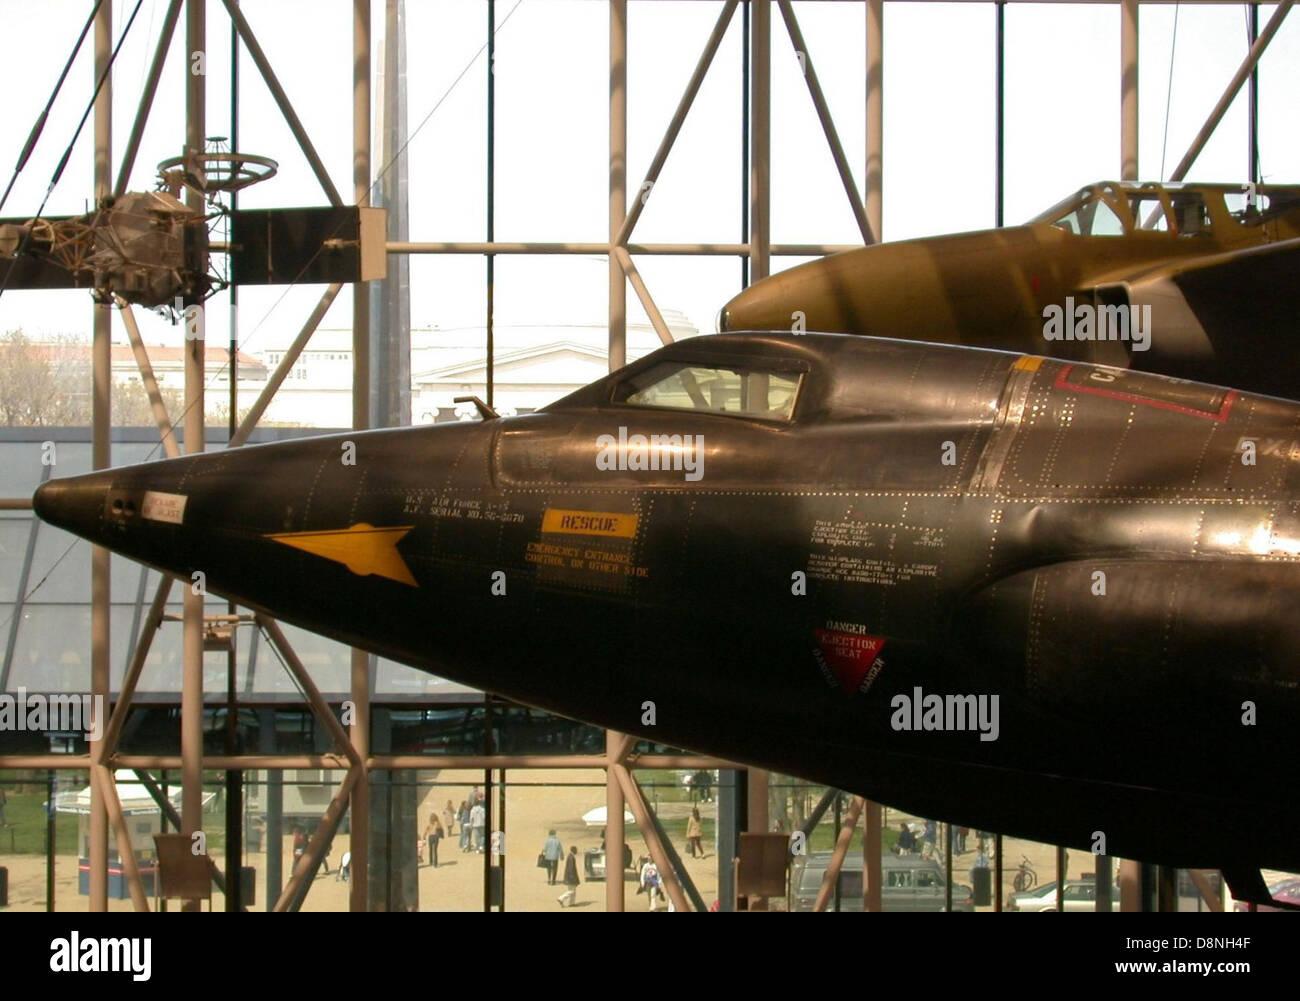 X 15 rocket plane. - Stock Image